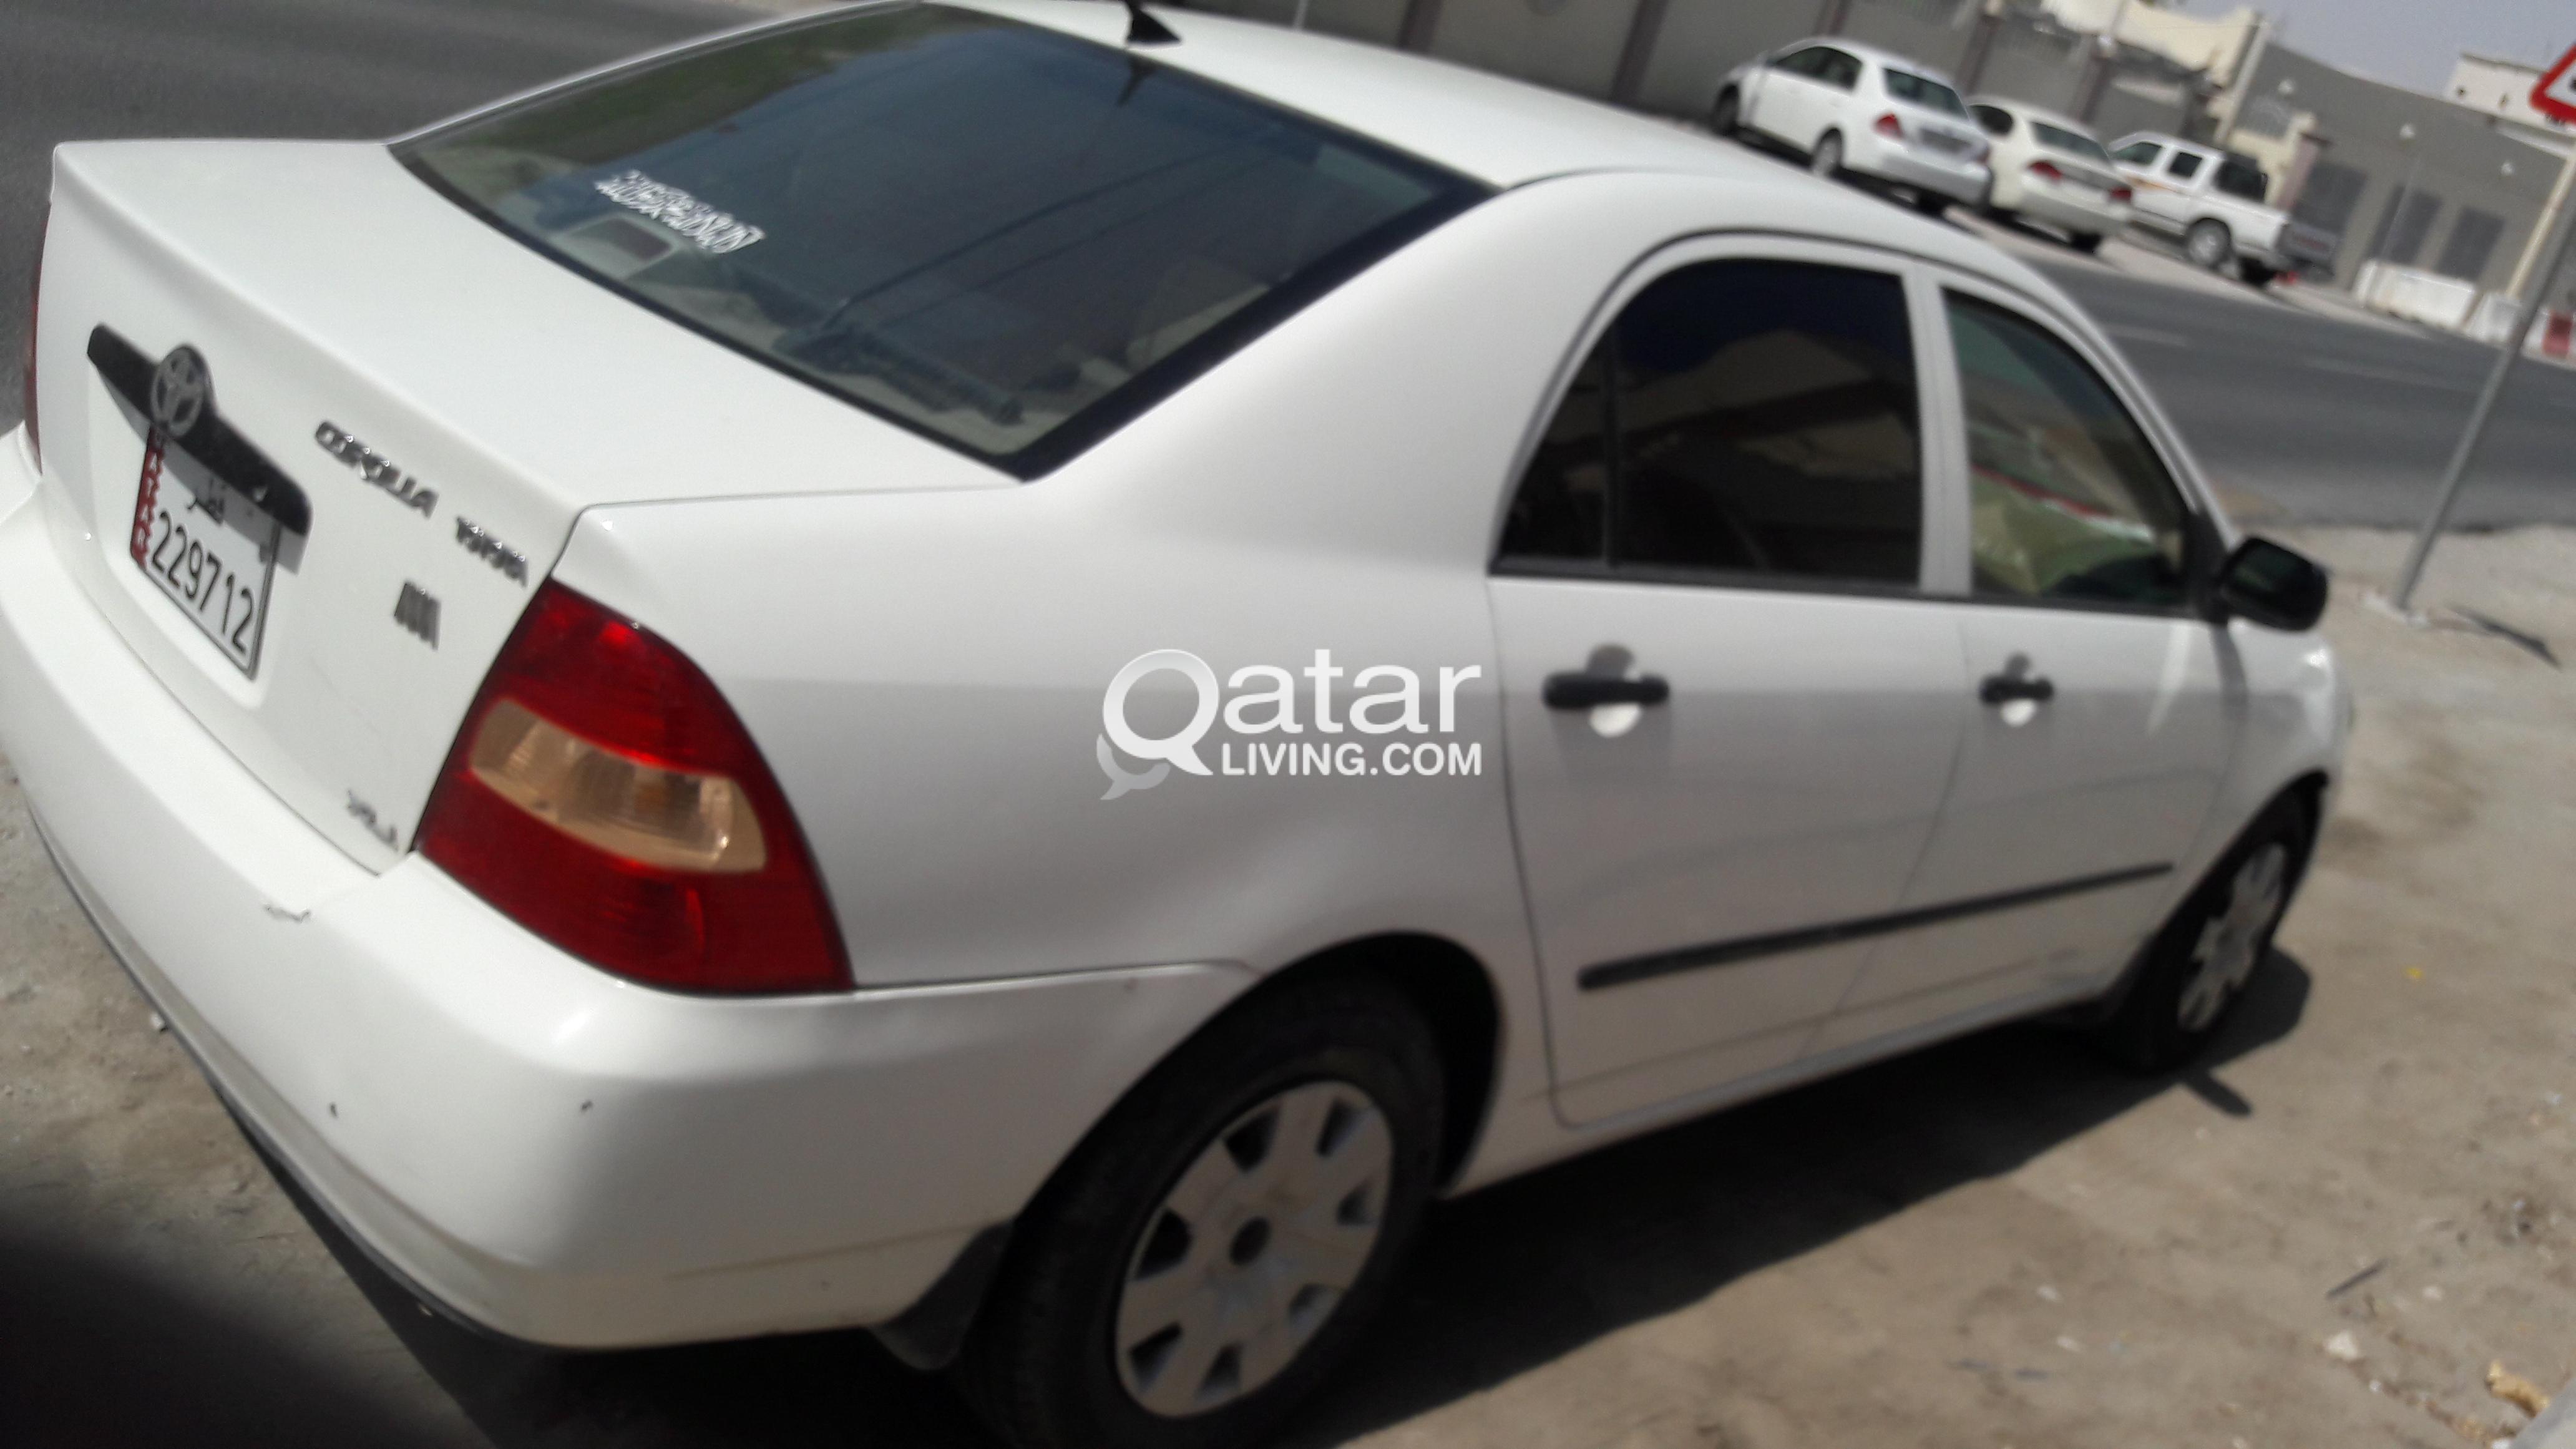 Toyota Corolla Low Mileage 2001 Price Qatar Living Hatchback Information Model